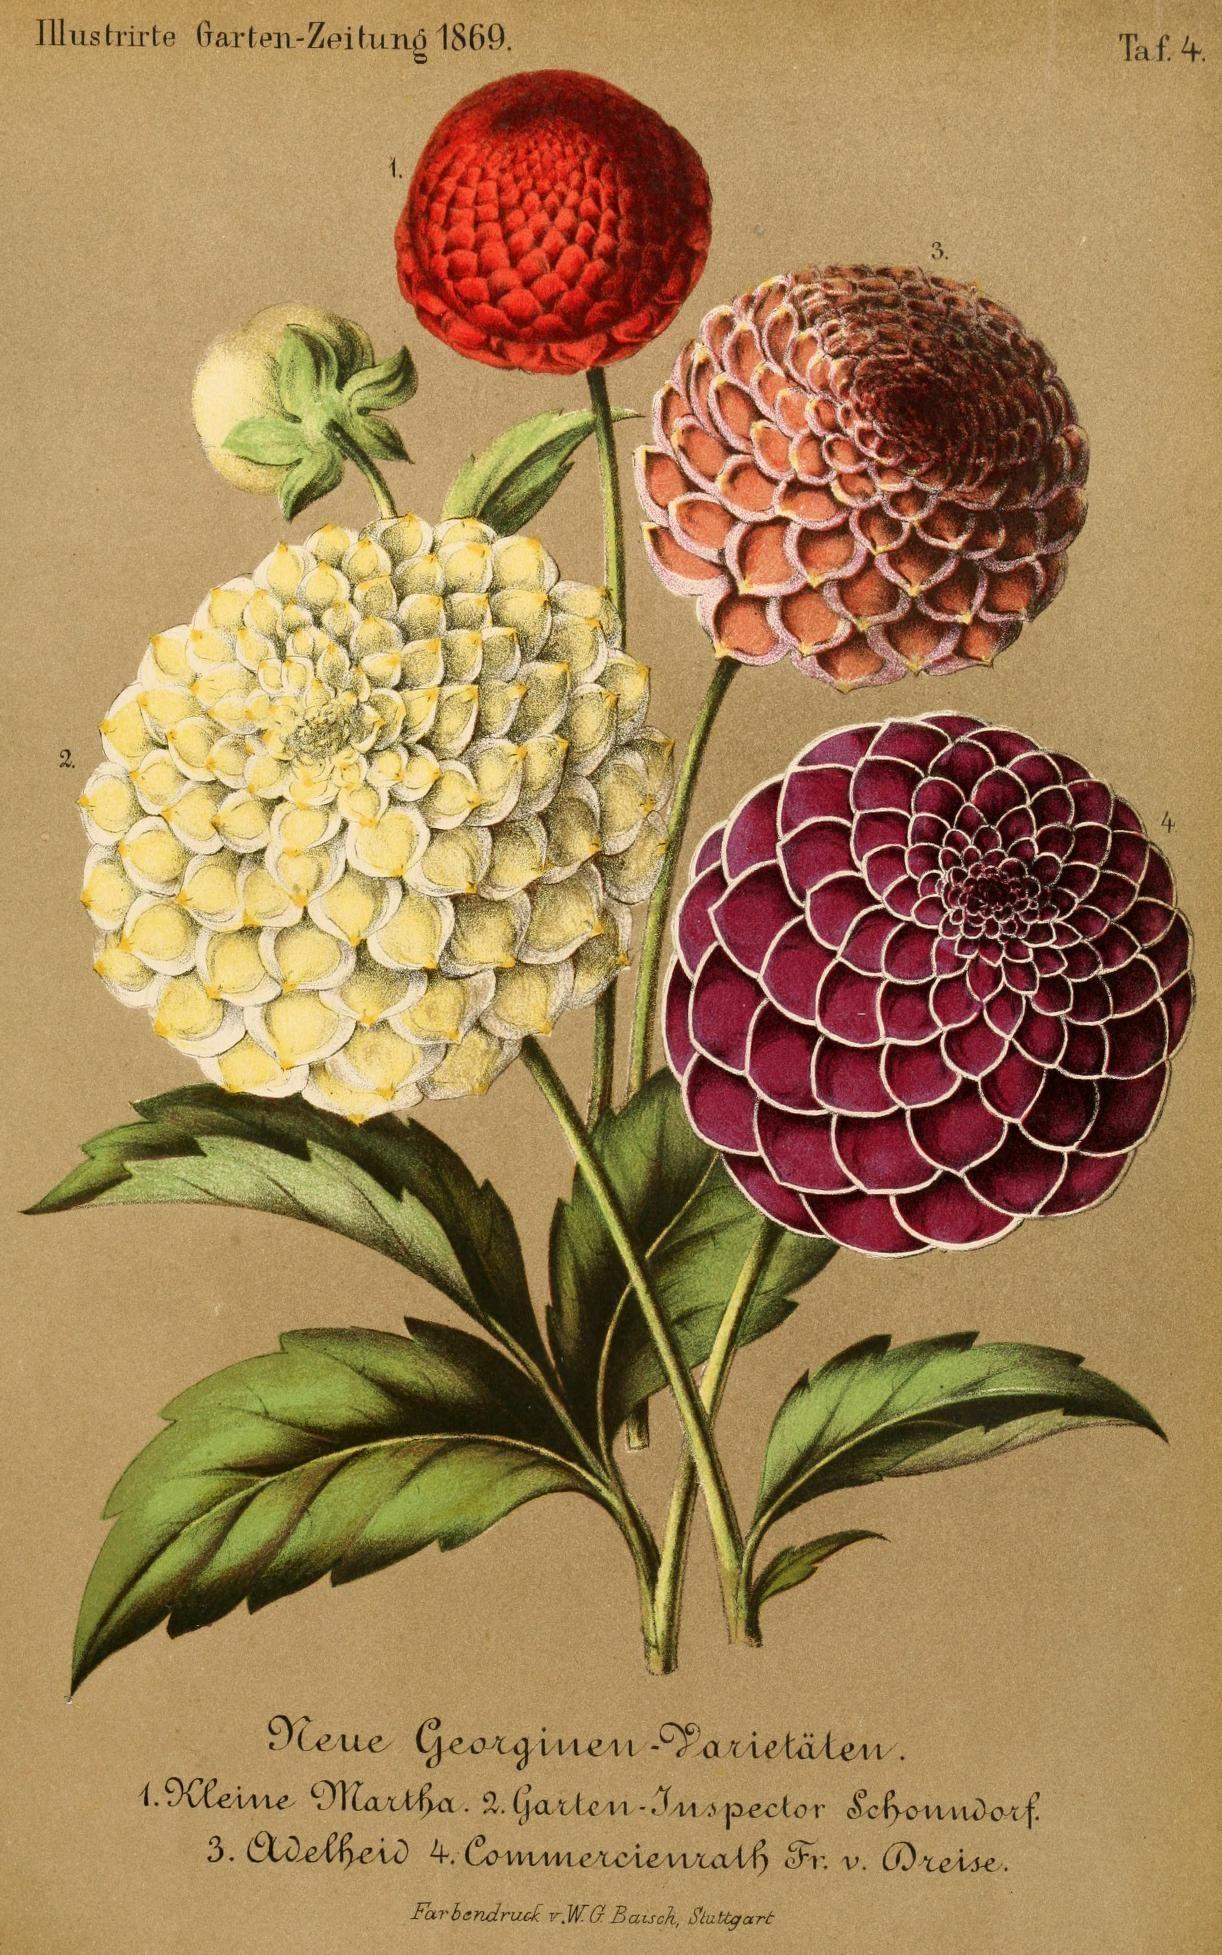 Bd 13 1869 Illustrierte Garten Zeitung Biodiversity Heritage Library Botanical Painting Botanical Art Digital Flowers